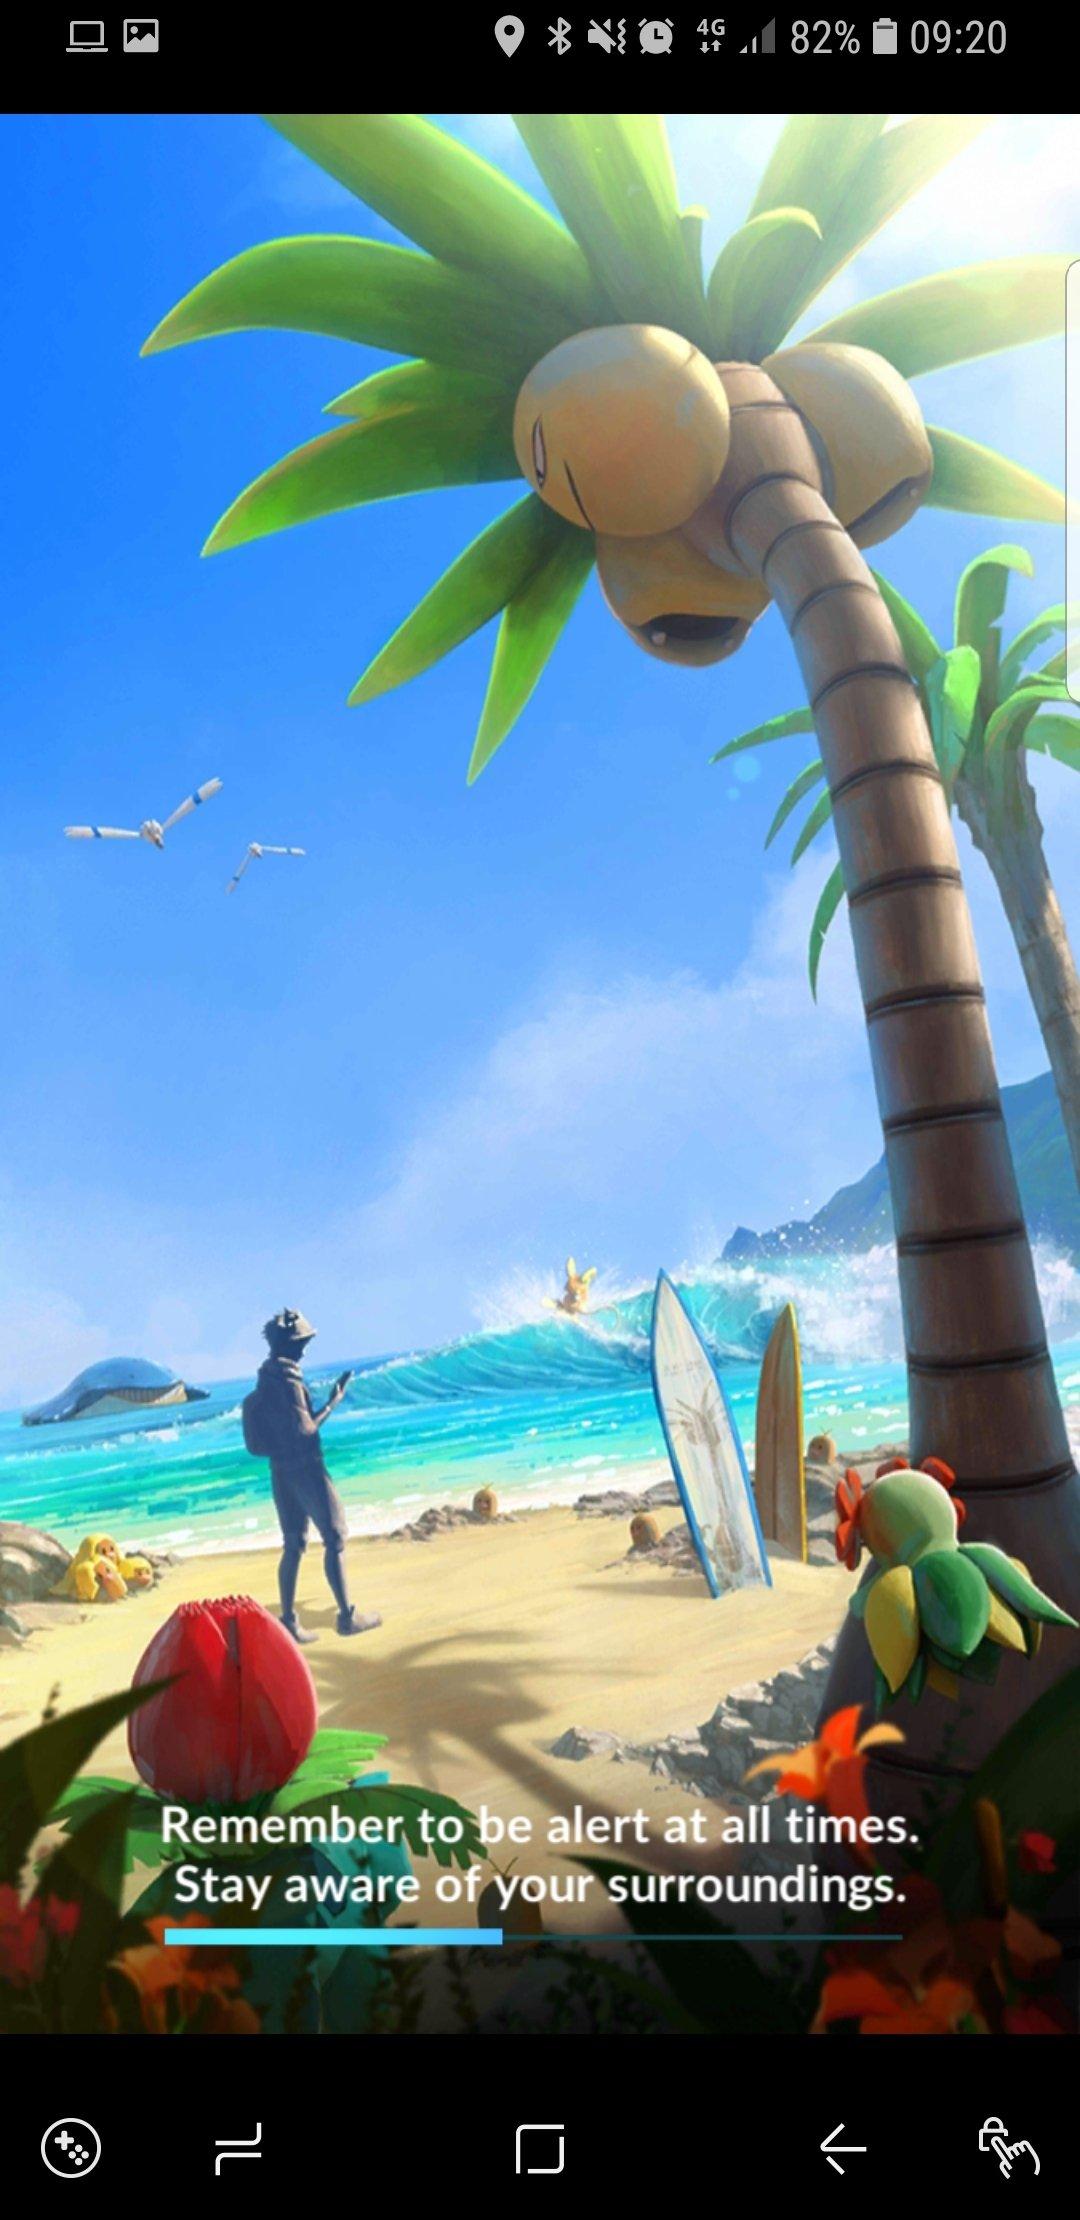 Pokémon GO 0 151 0 - Download for PC Free